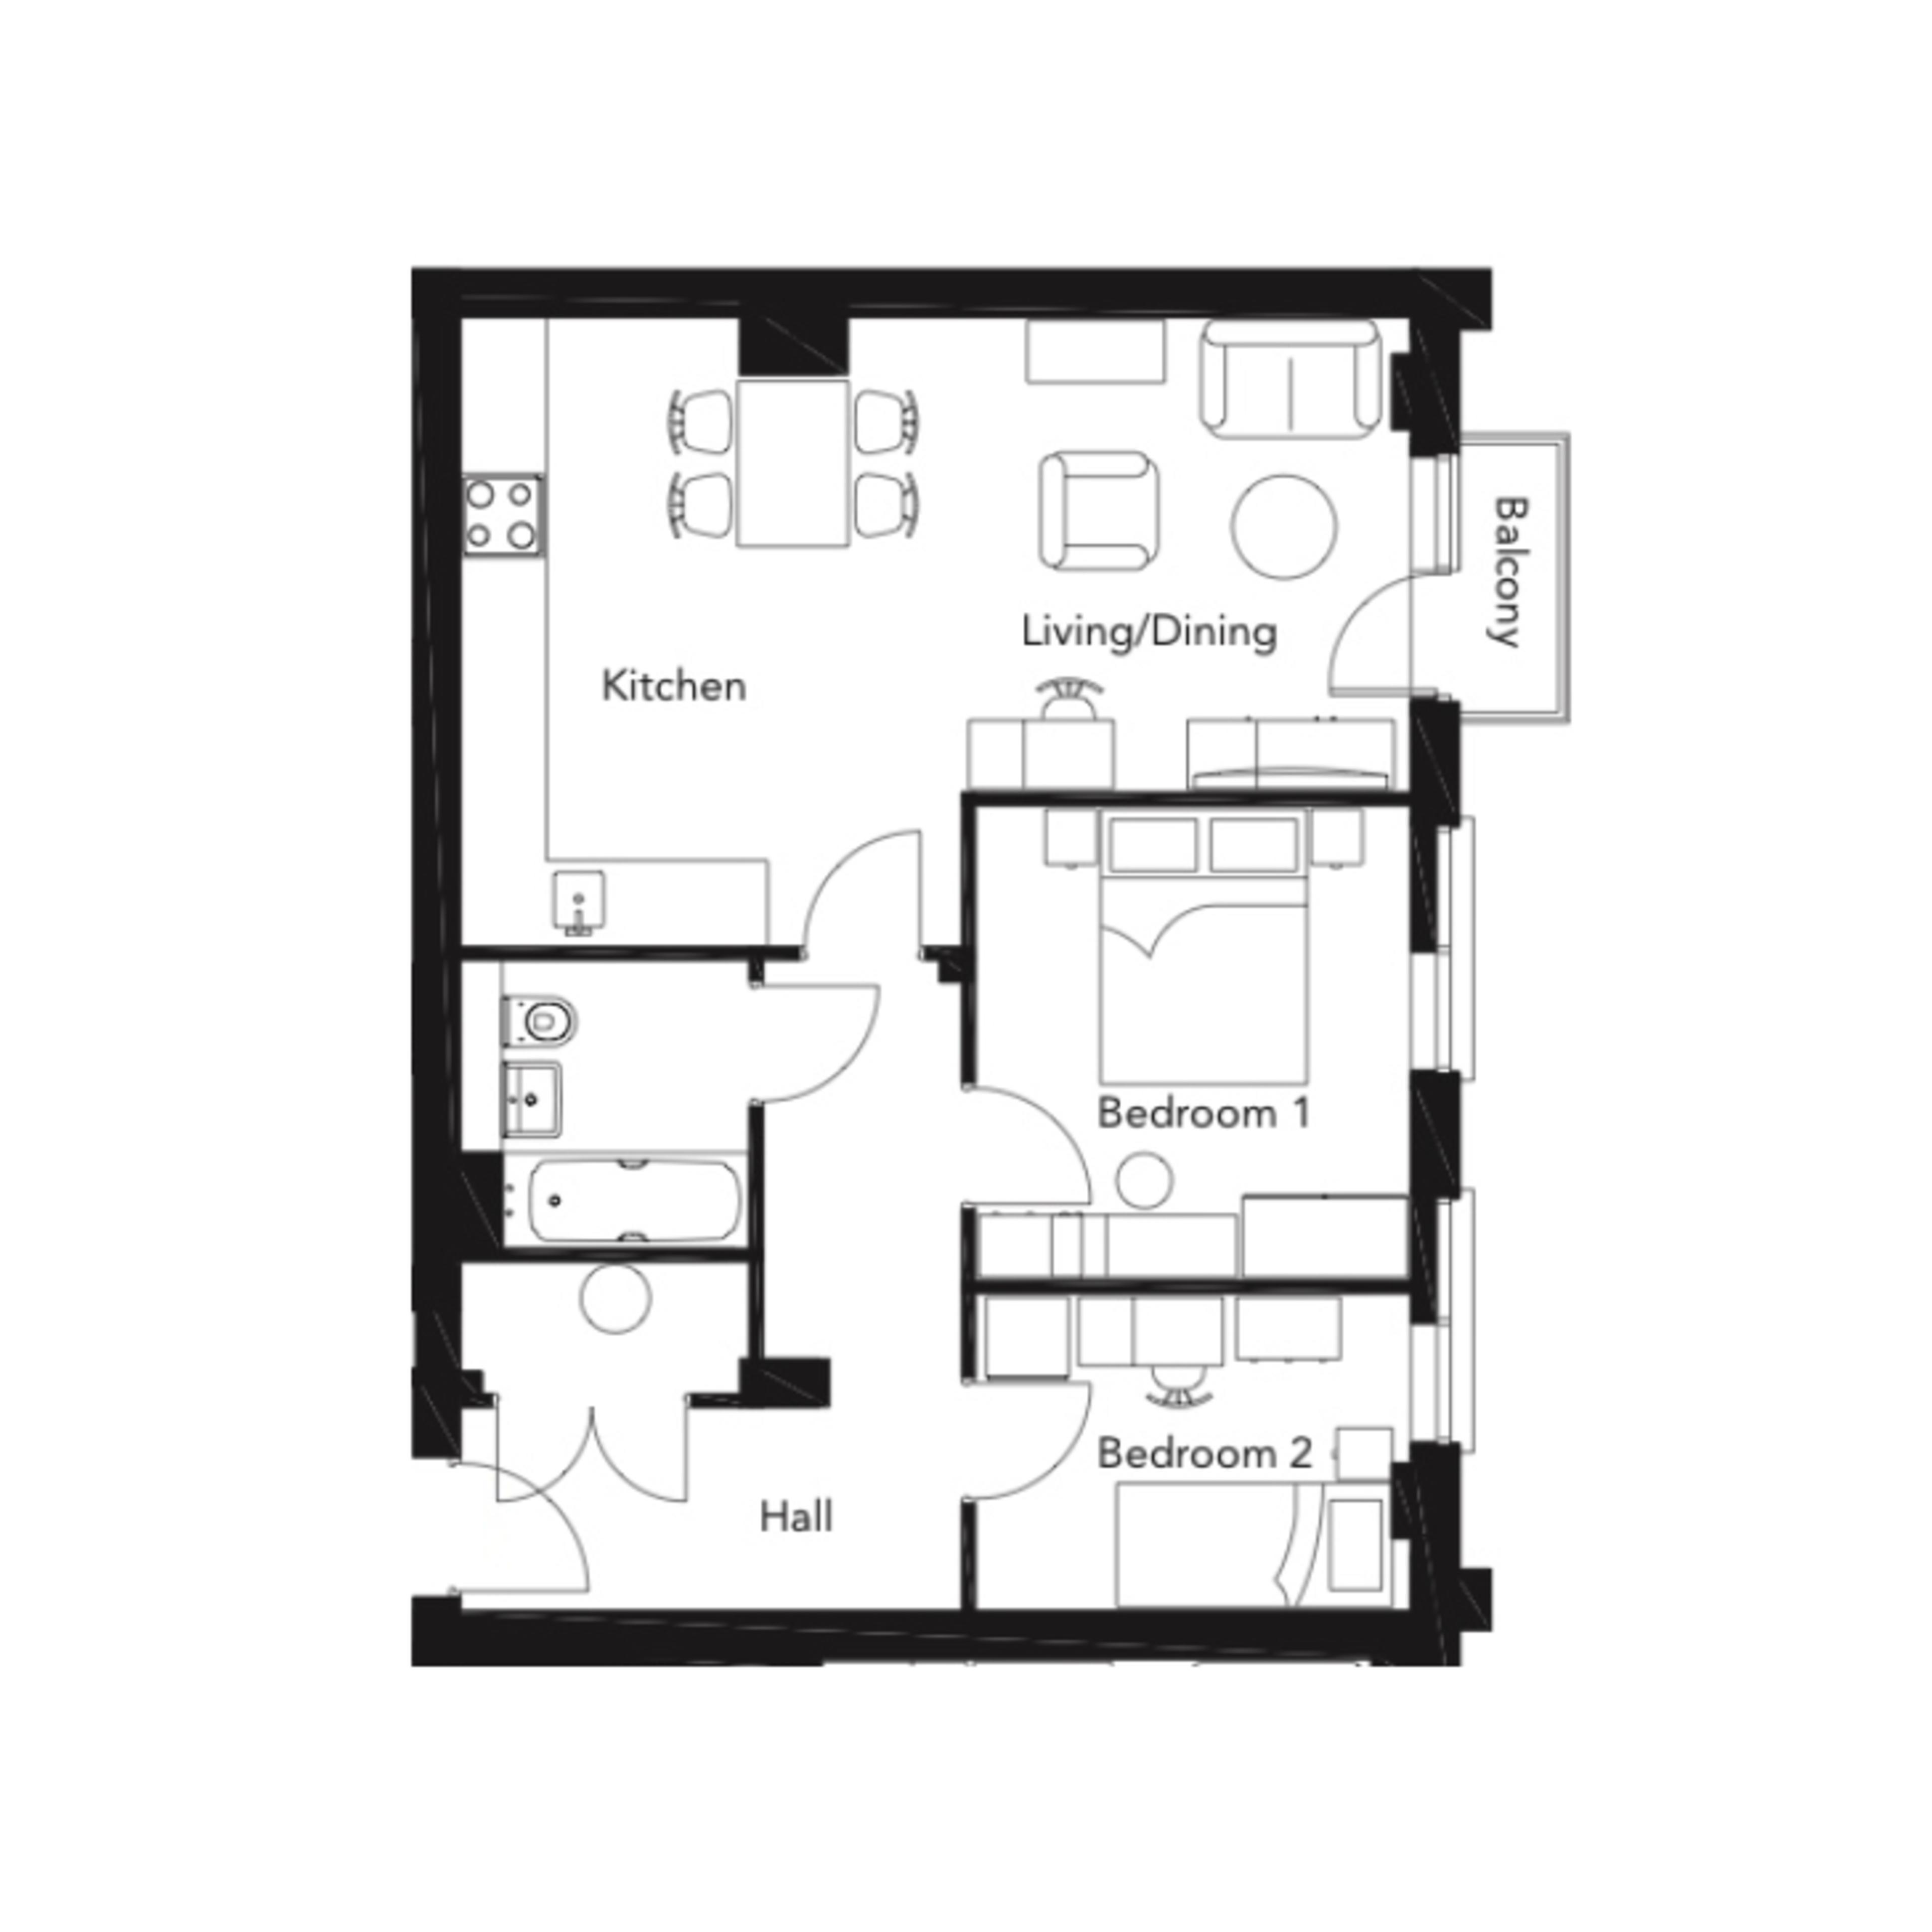 Franklin Court new two bedroom apartment type h floorplan flat 101